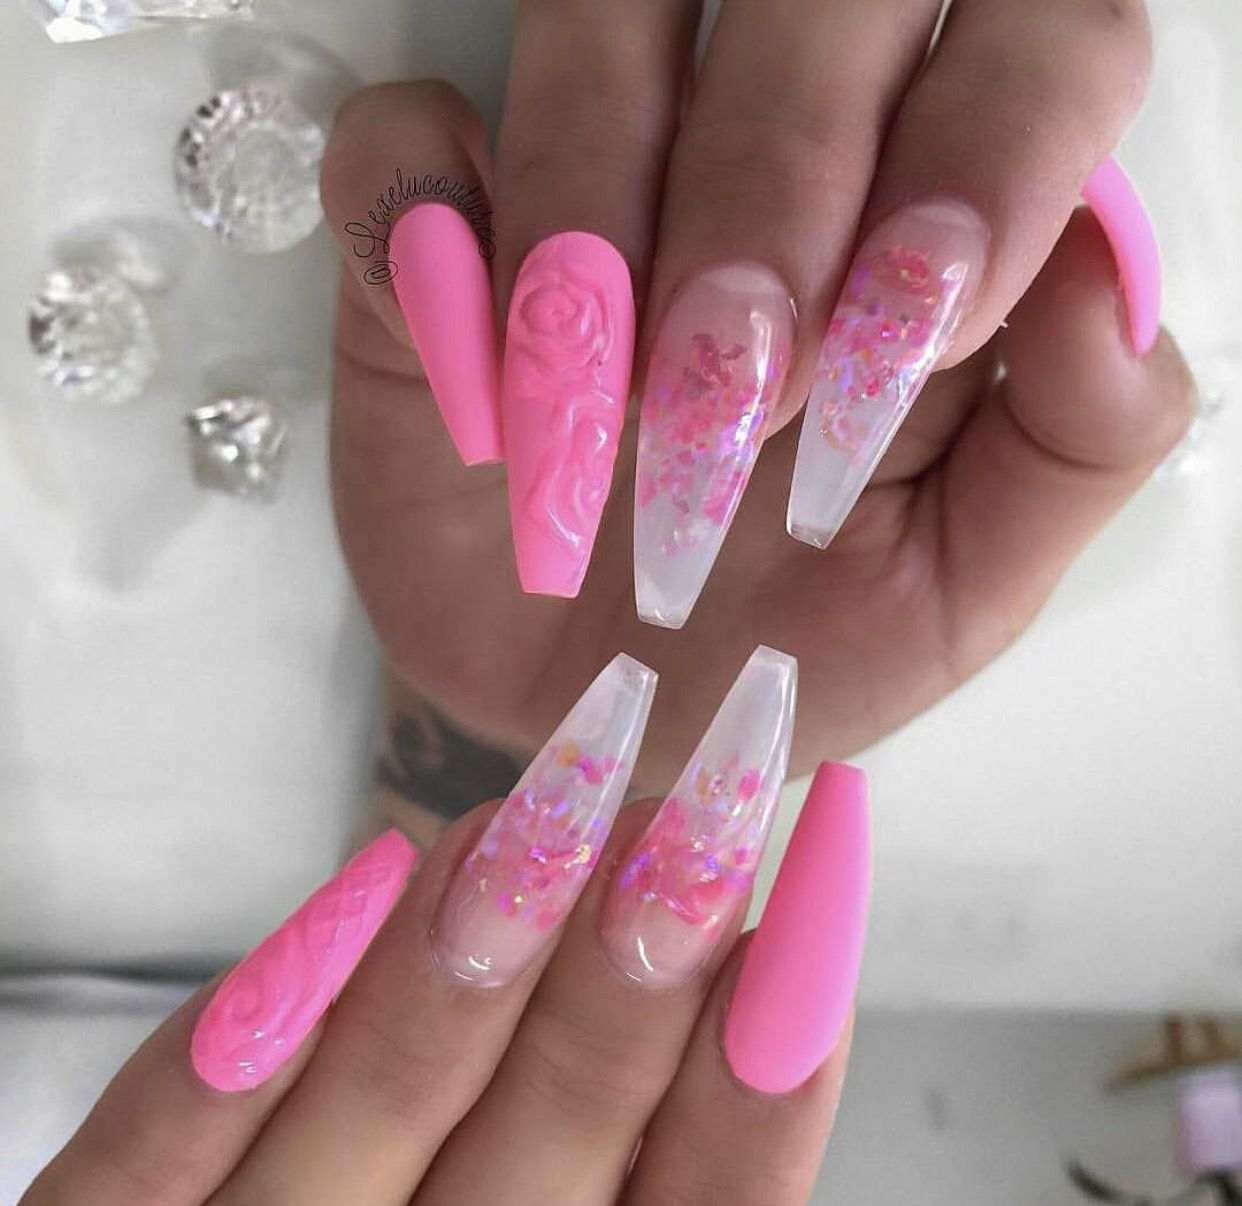 fluorescent pink acrylic nails photo - 1